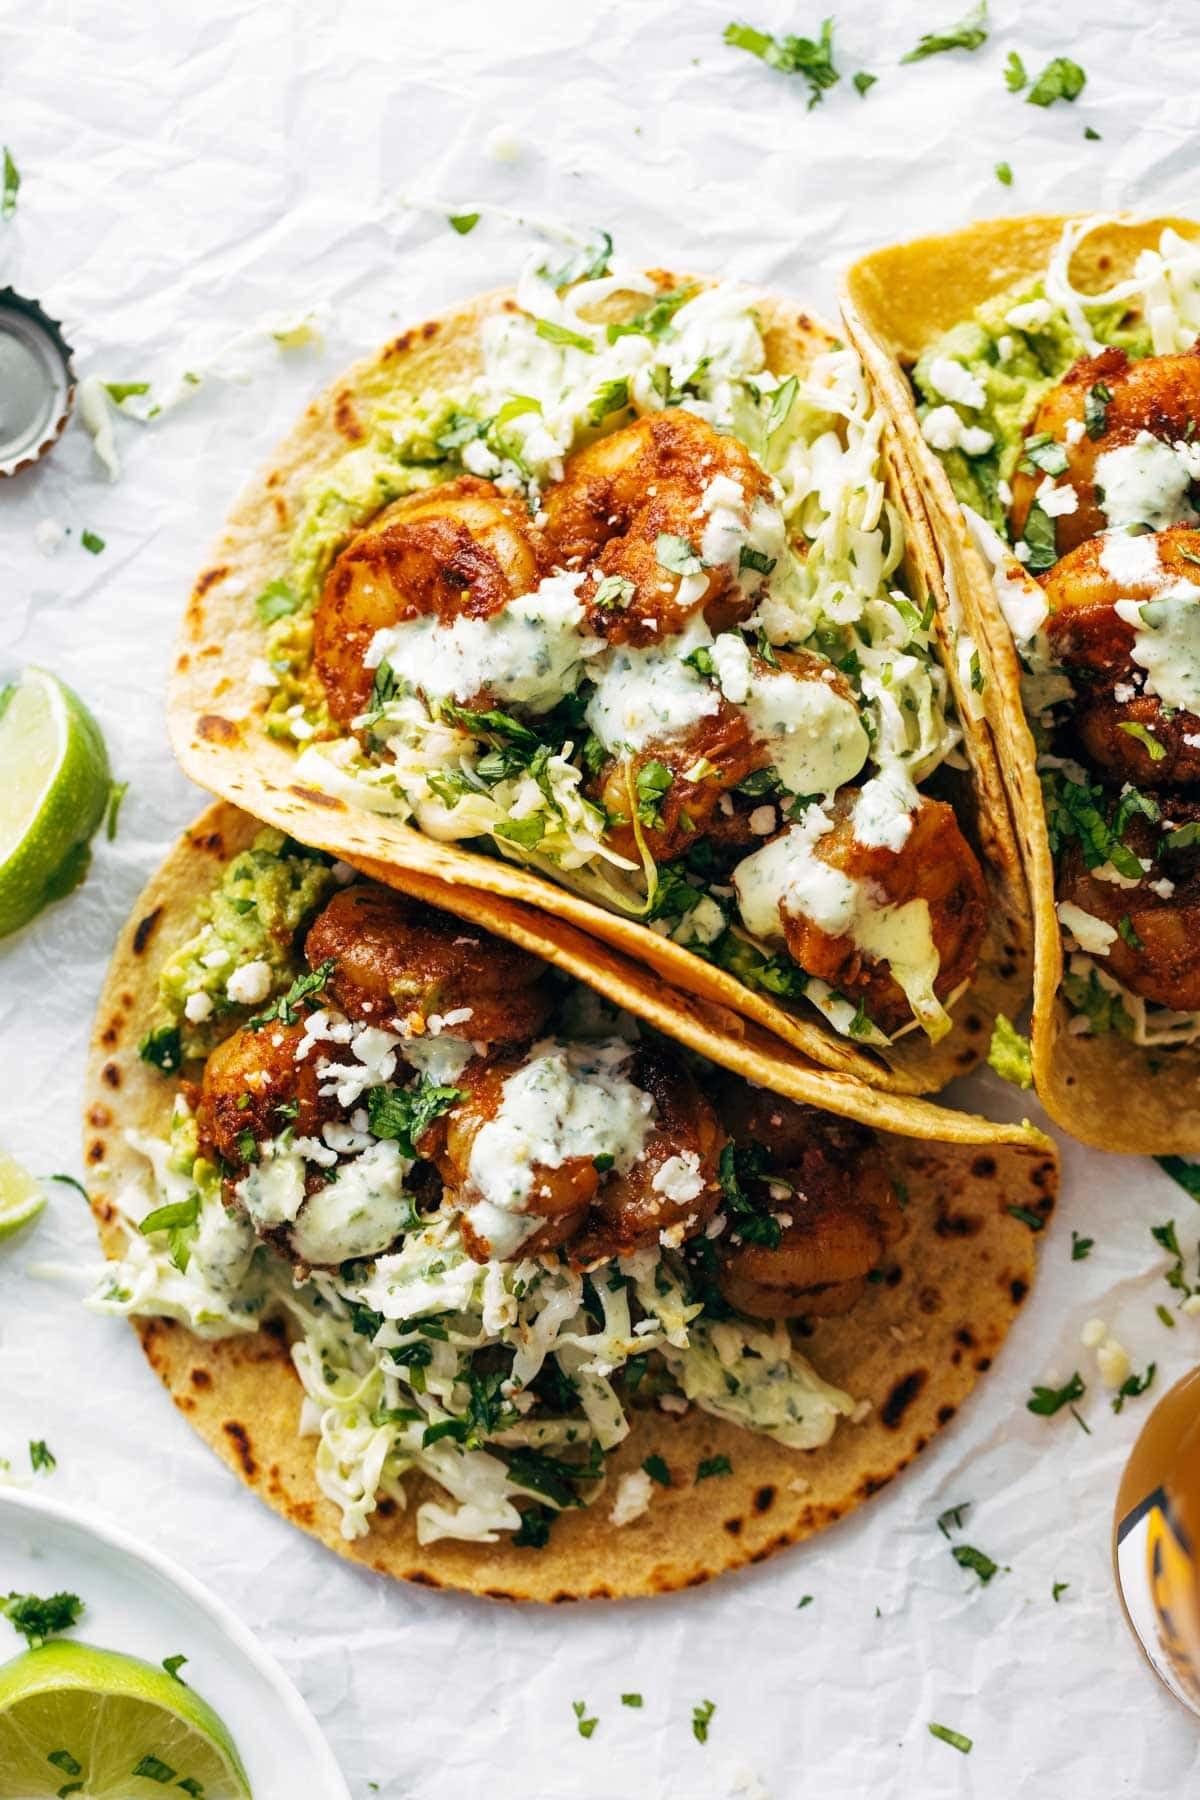 Shrimp tacos with slaw.